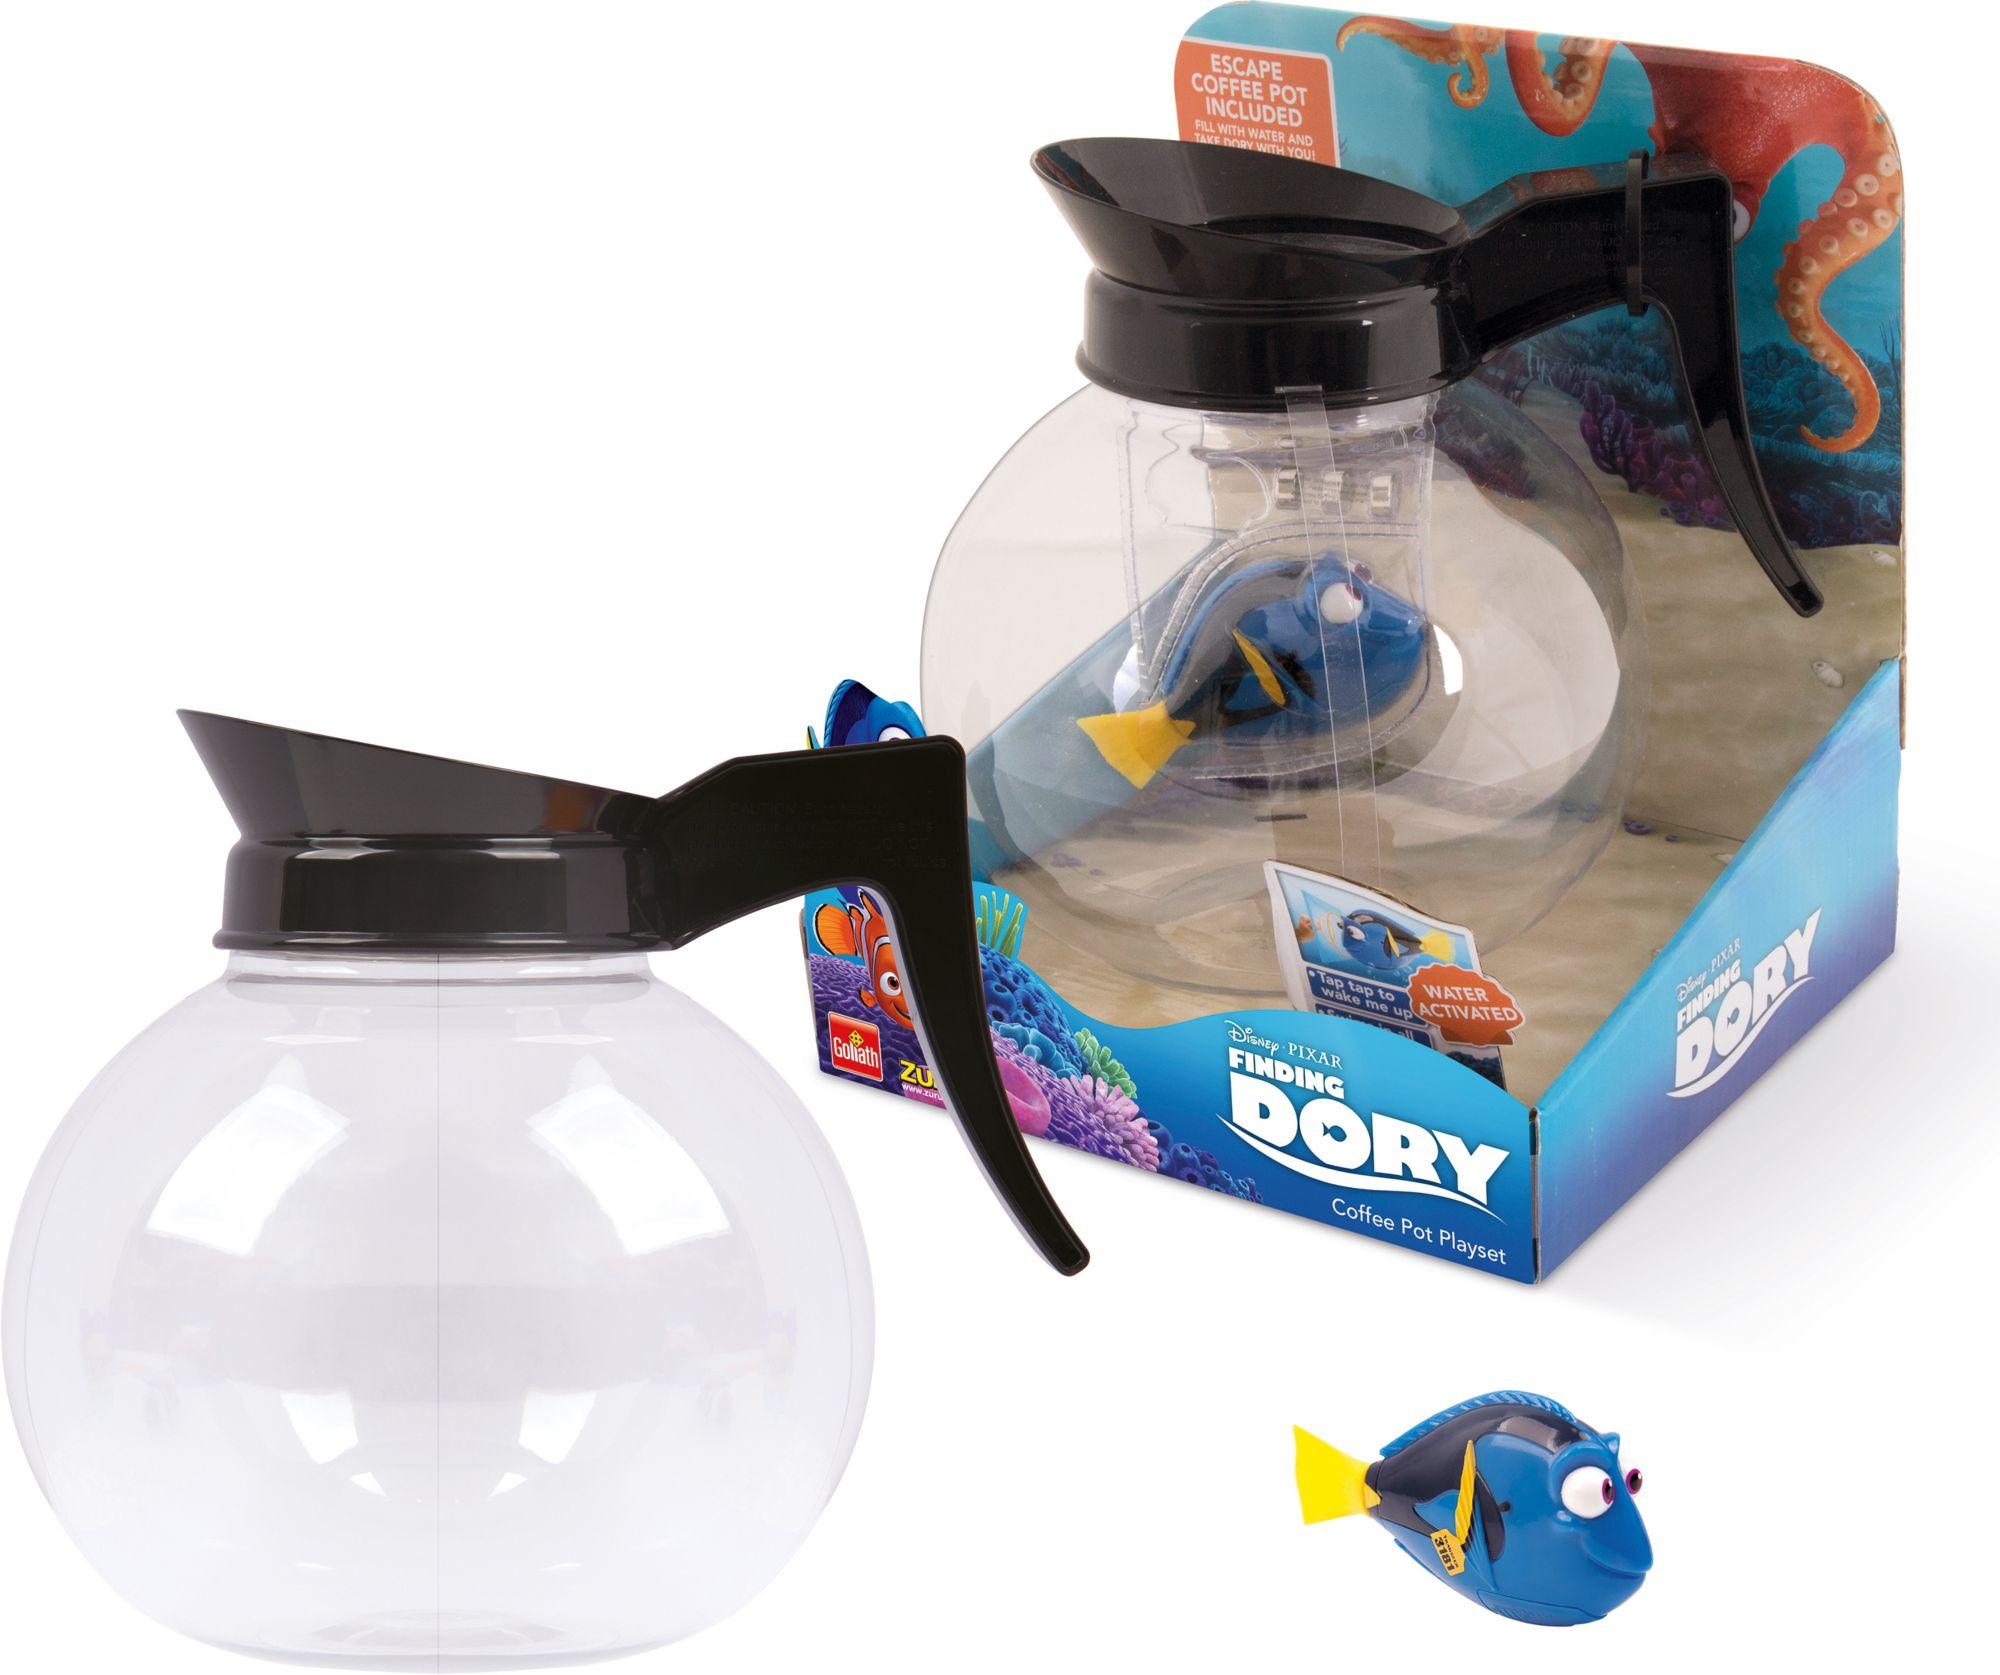 GOLIATH Goliath Wasserspielzeug, »Disney Pixar Finding Dory - Coffee Pot Playset«